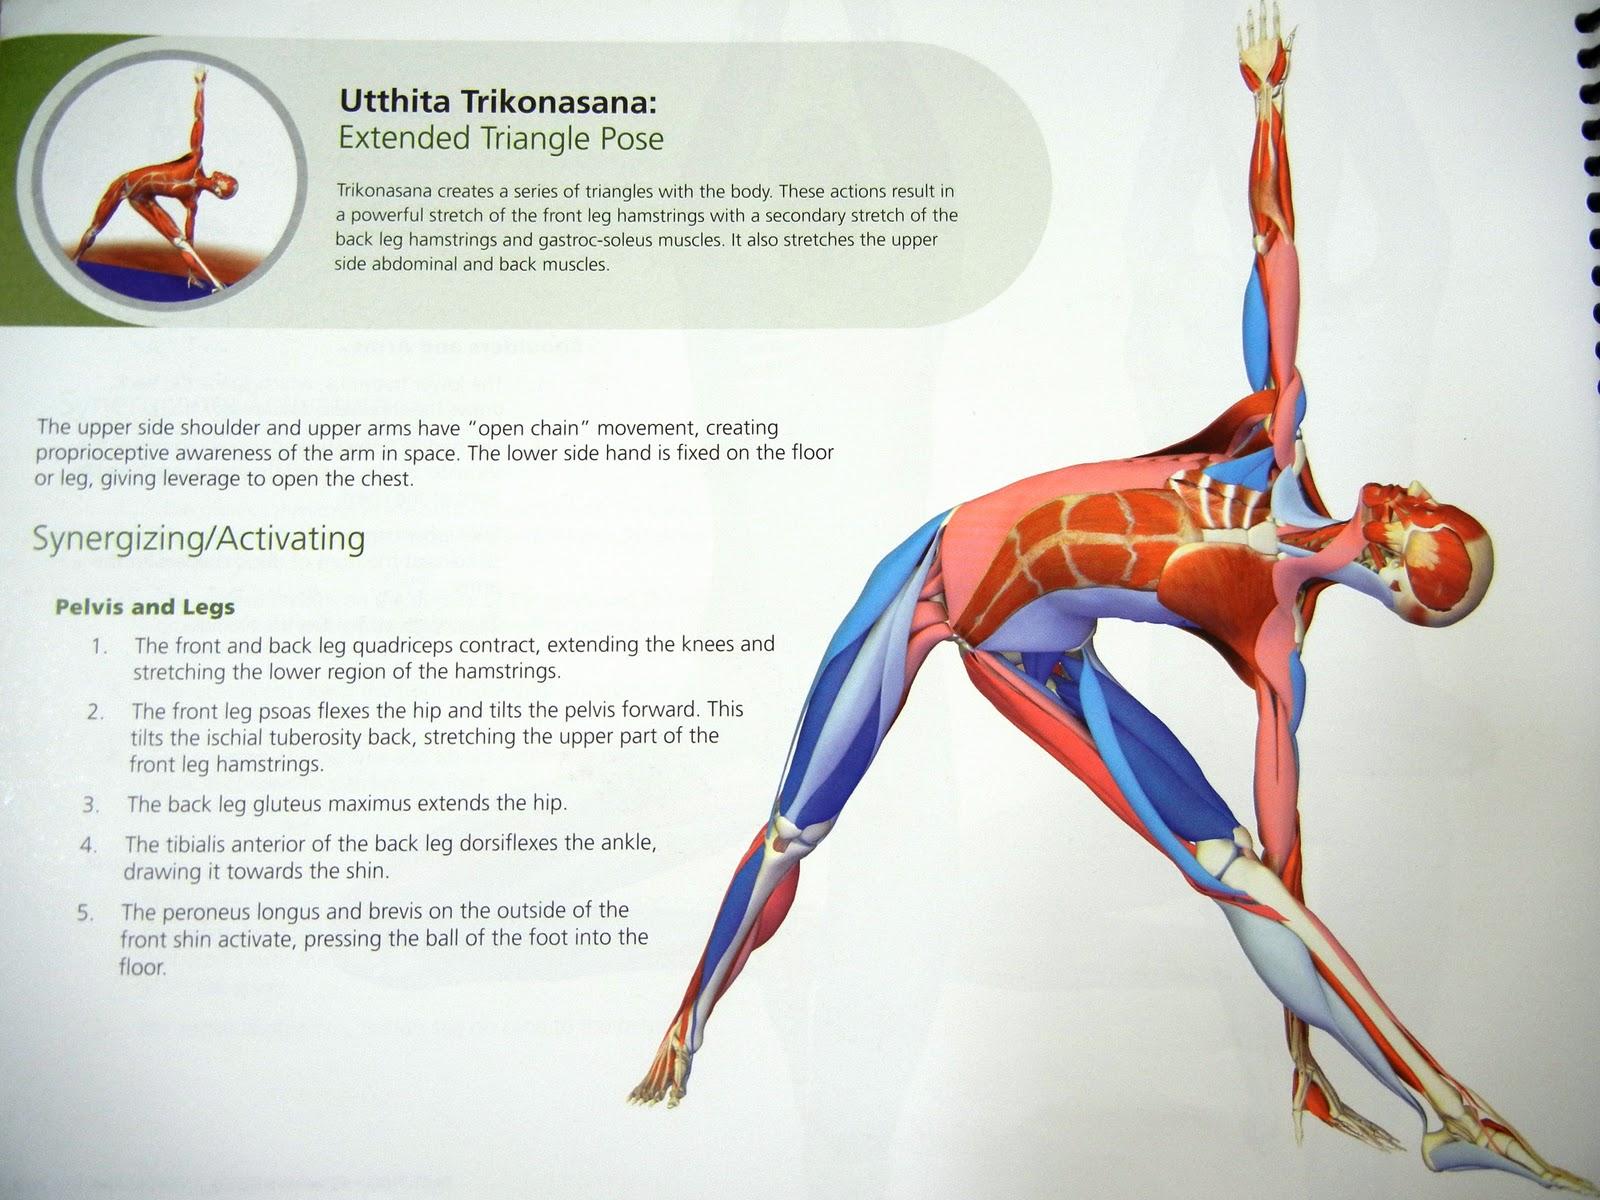 The Elegant Klutz: Utthita Trikonasana or Triangle Pose